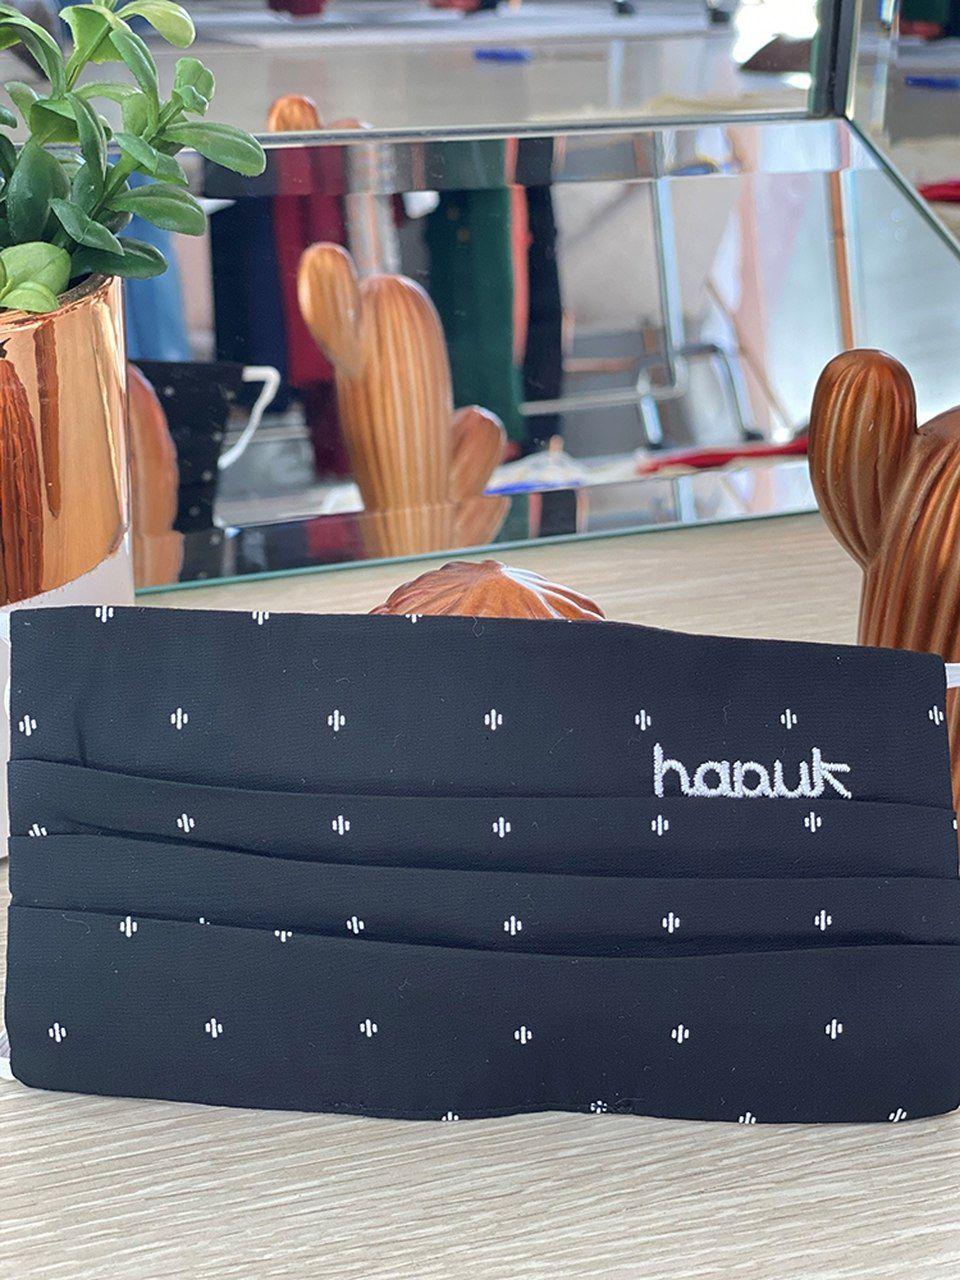 Máscaras de proteção reutilizável Hapuk